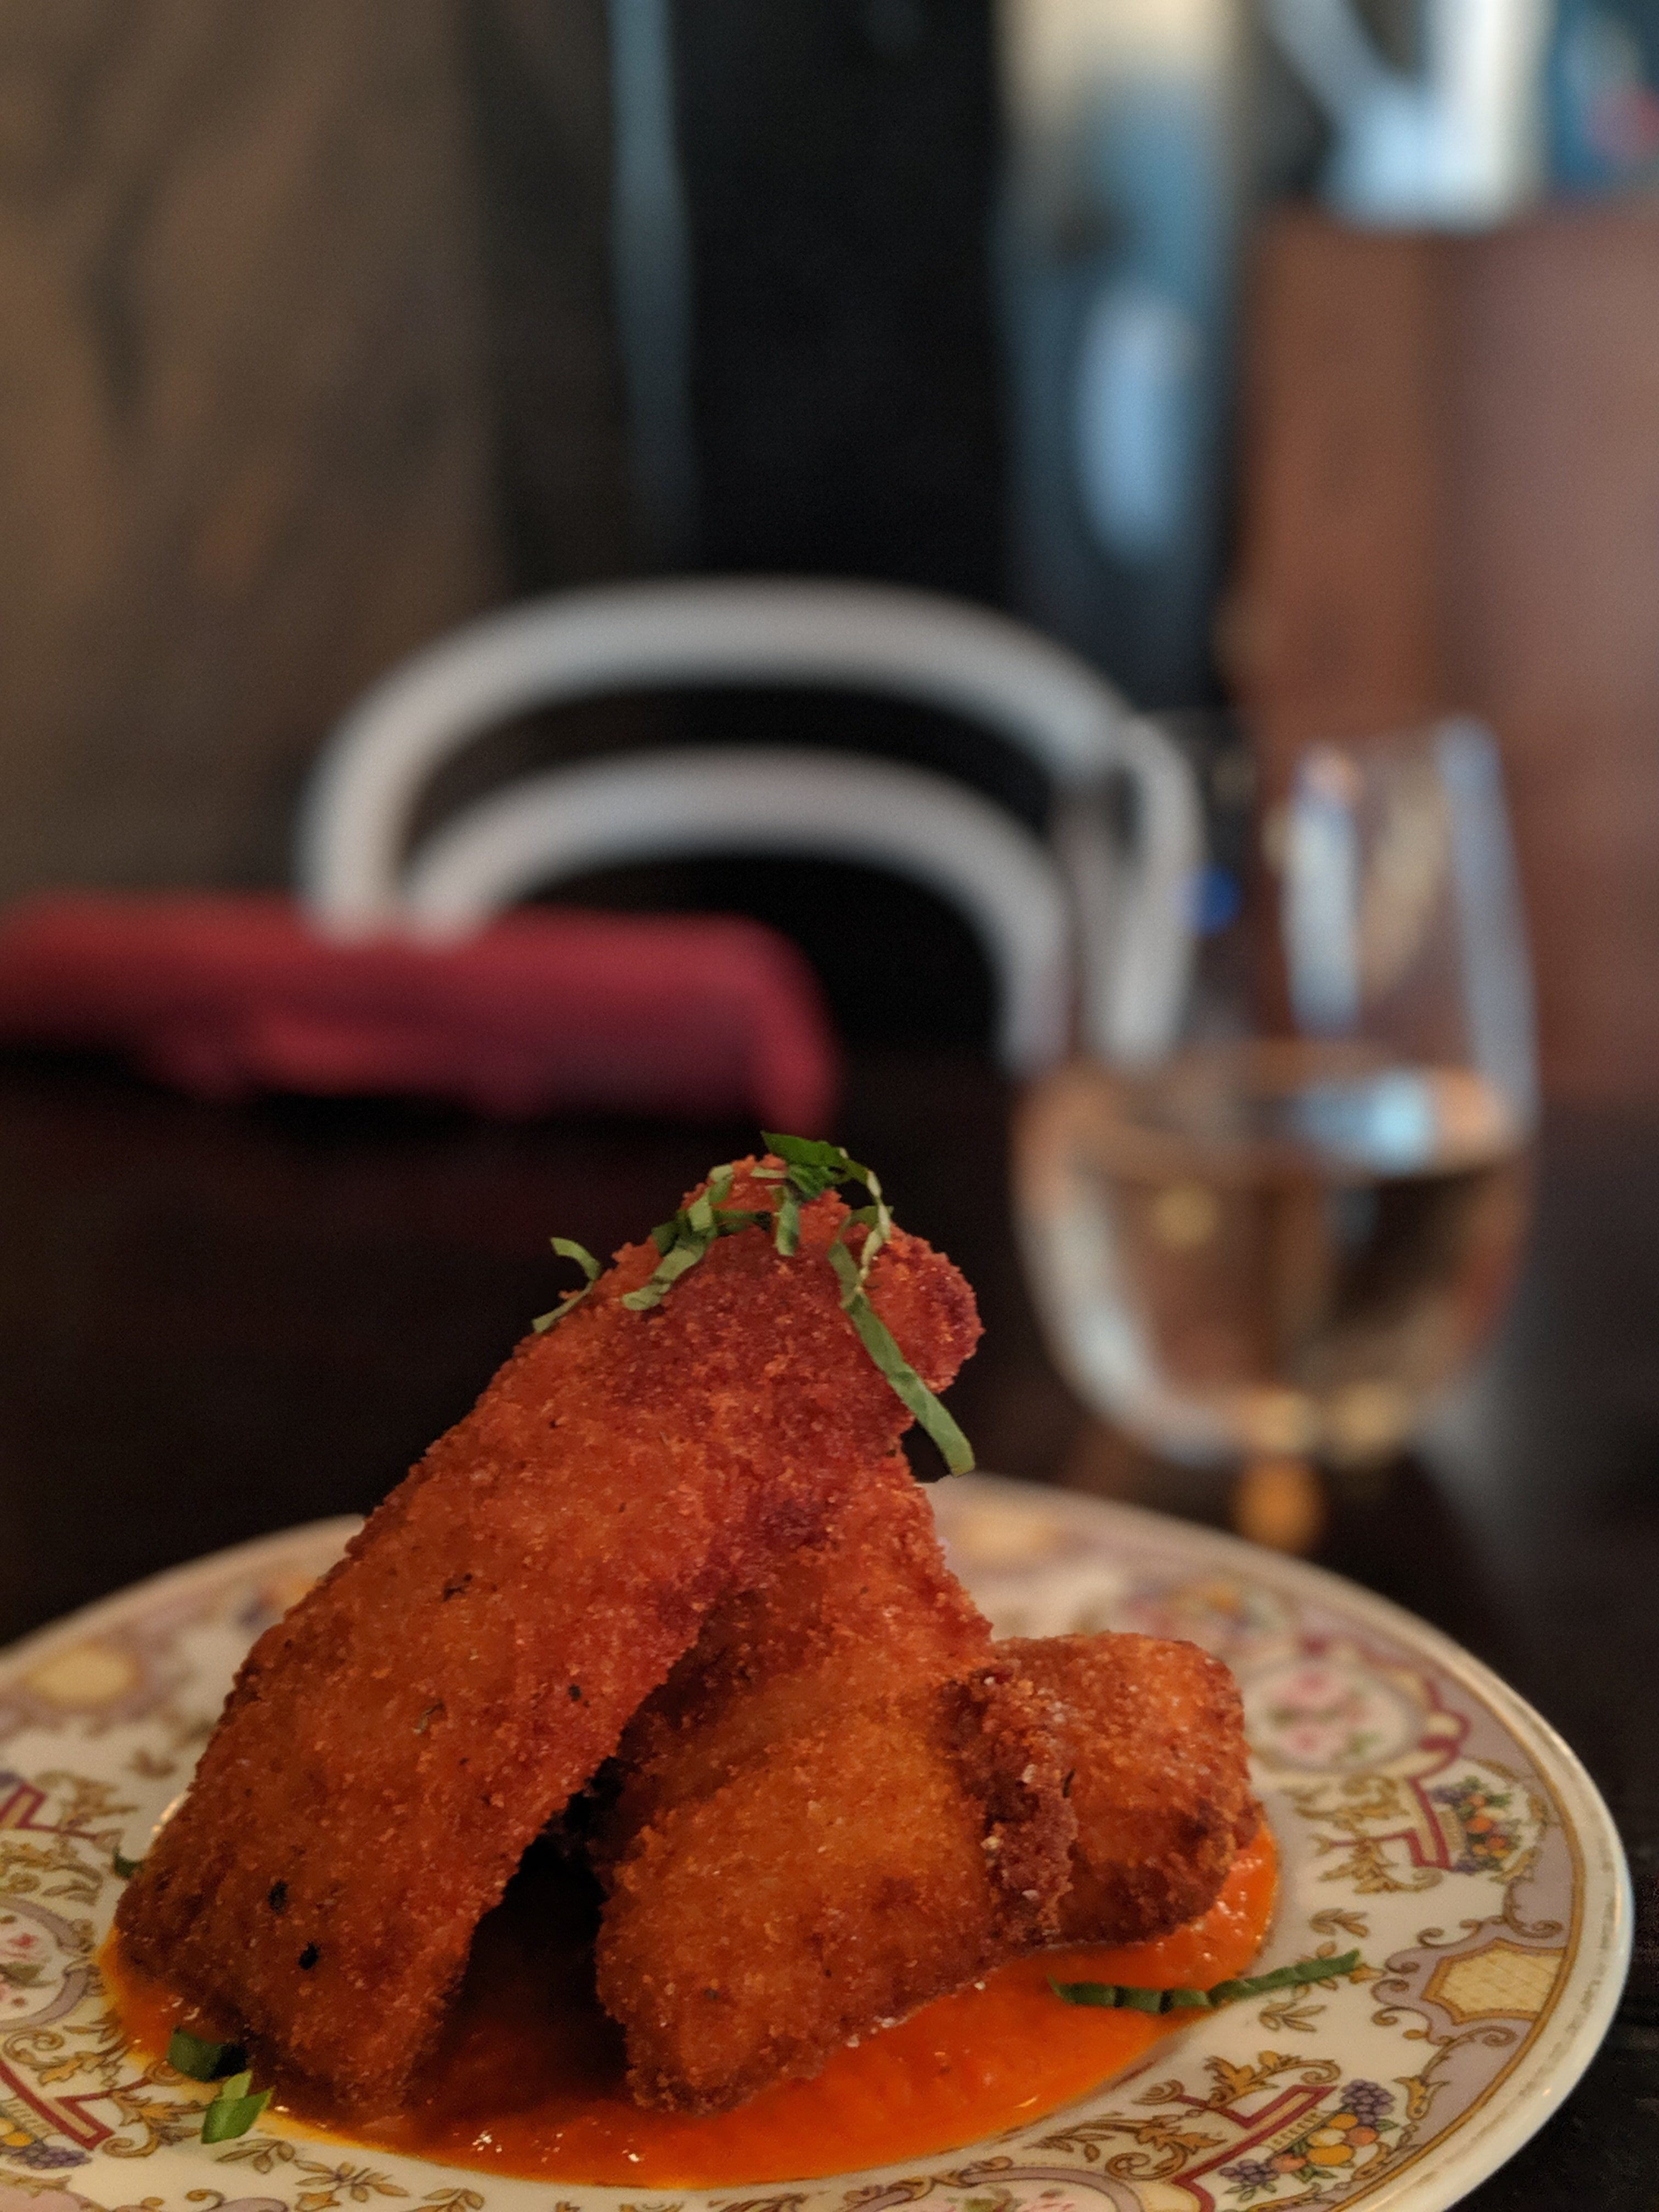 vegan mozzarella sticks at Modern Love in New York